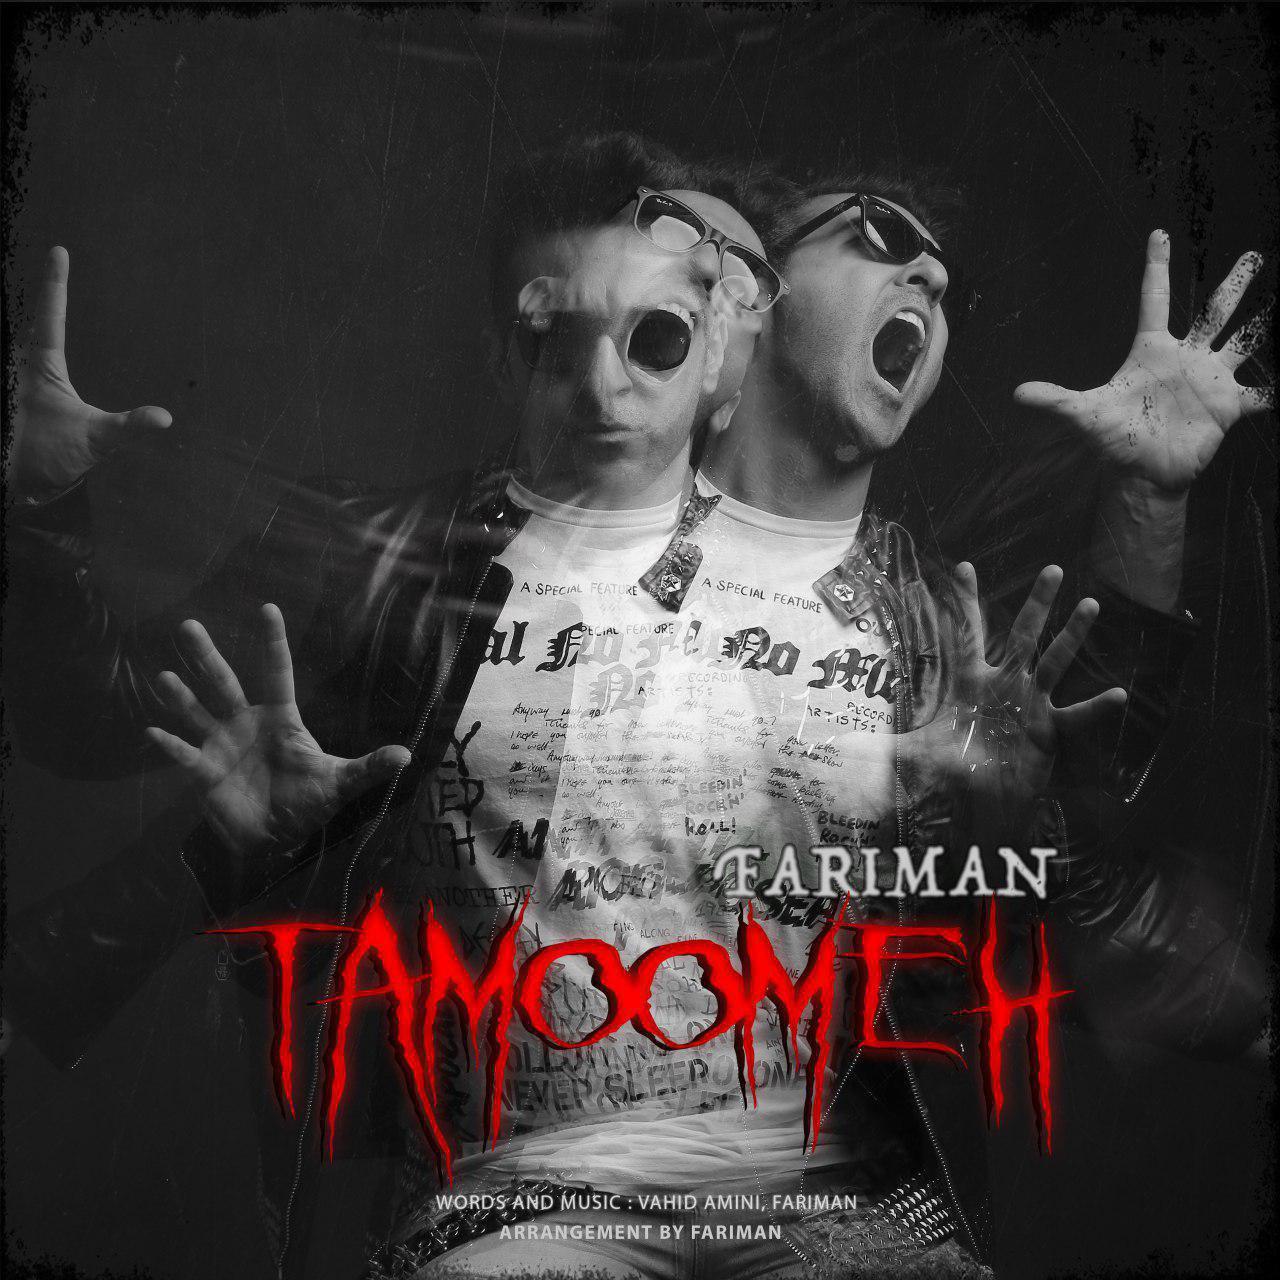 Fariman – Tamoomeh